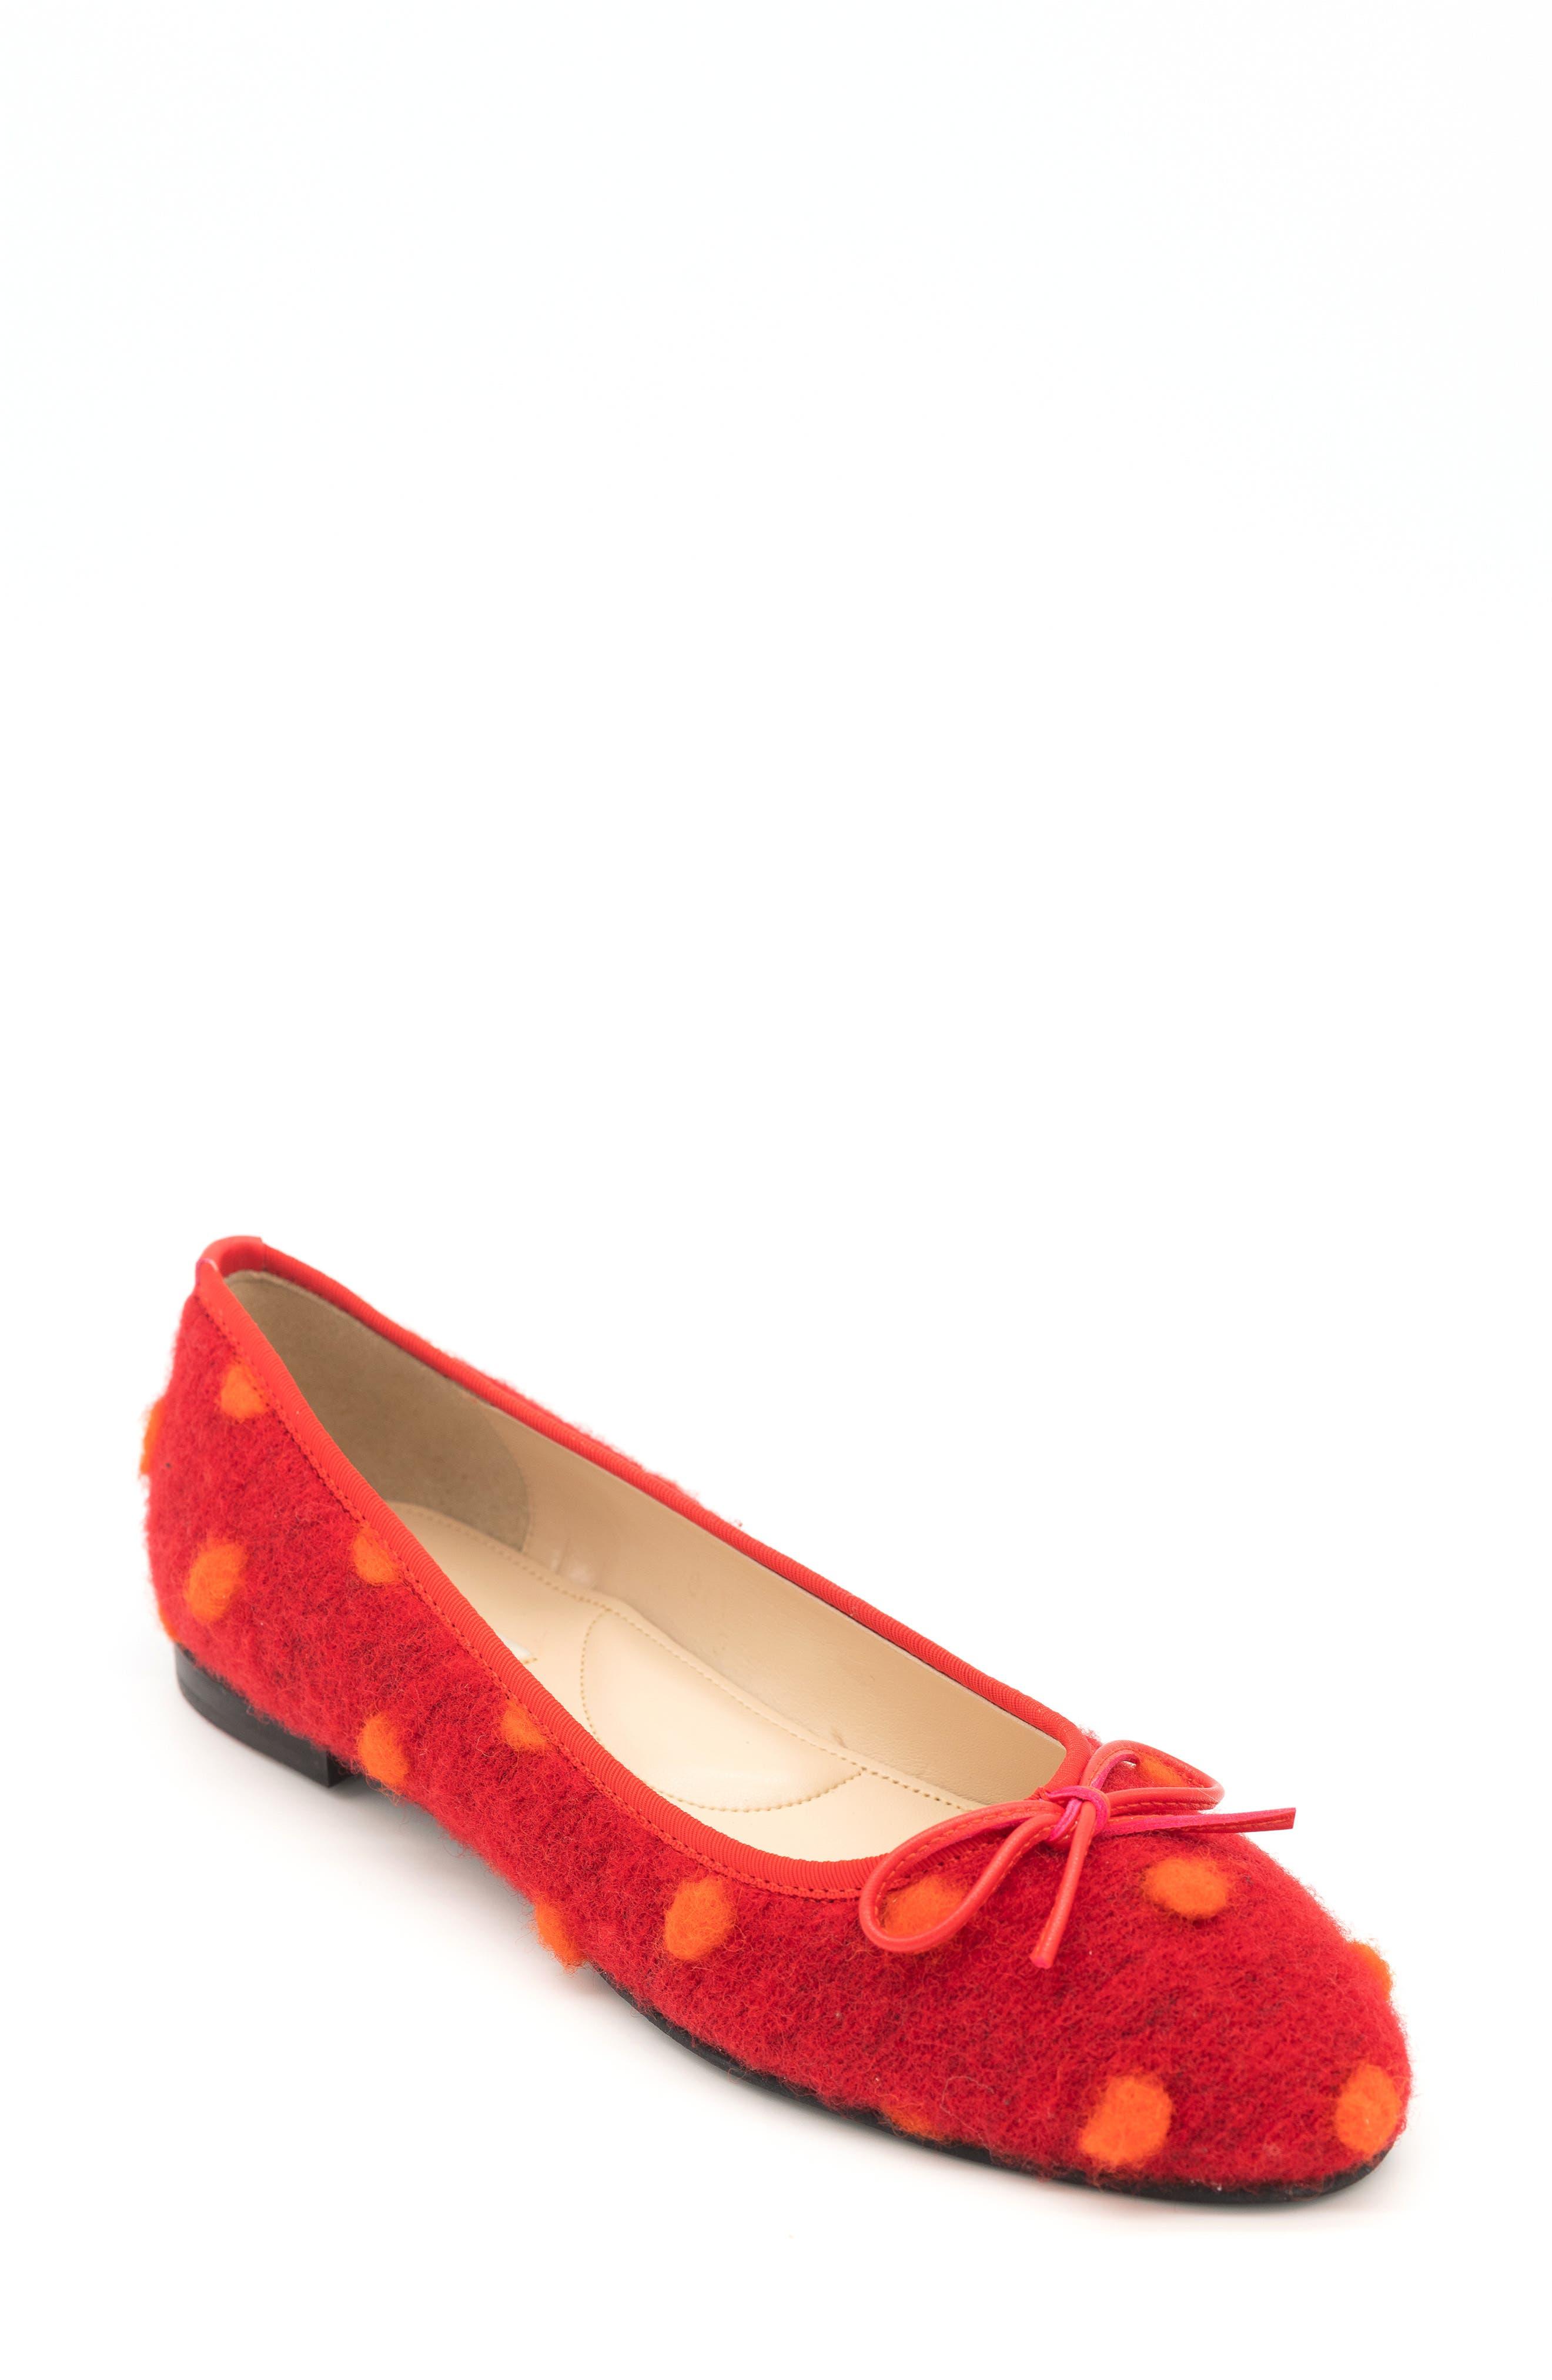 Pavlova Polka Dot Ballet Flat